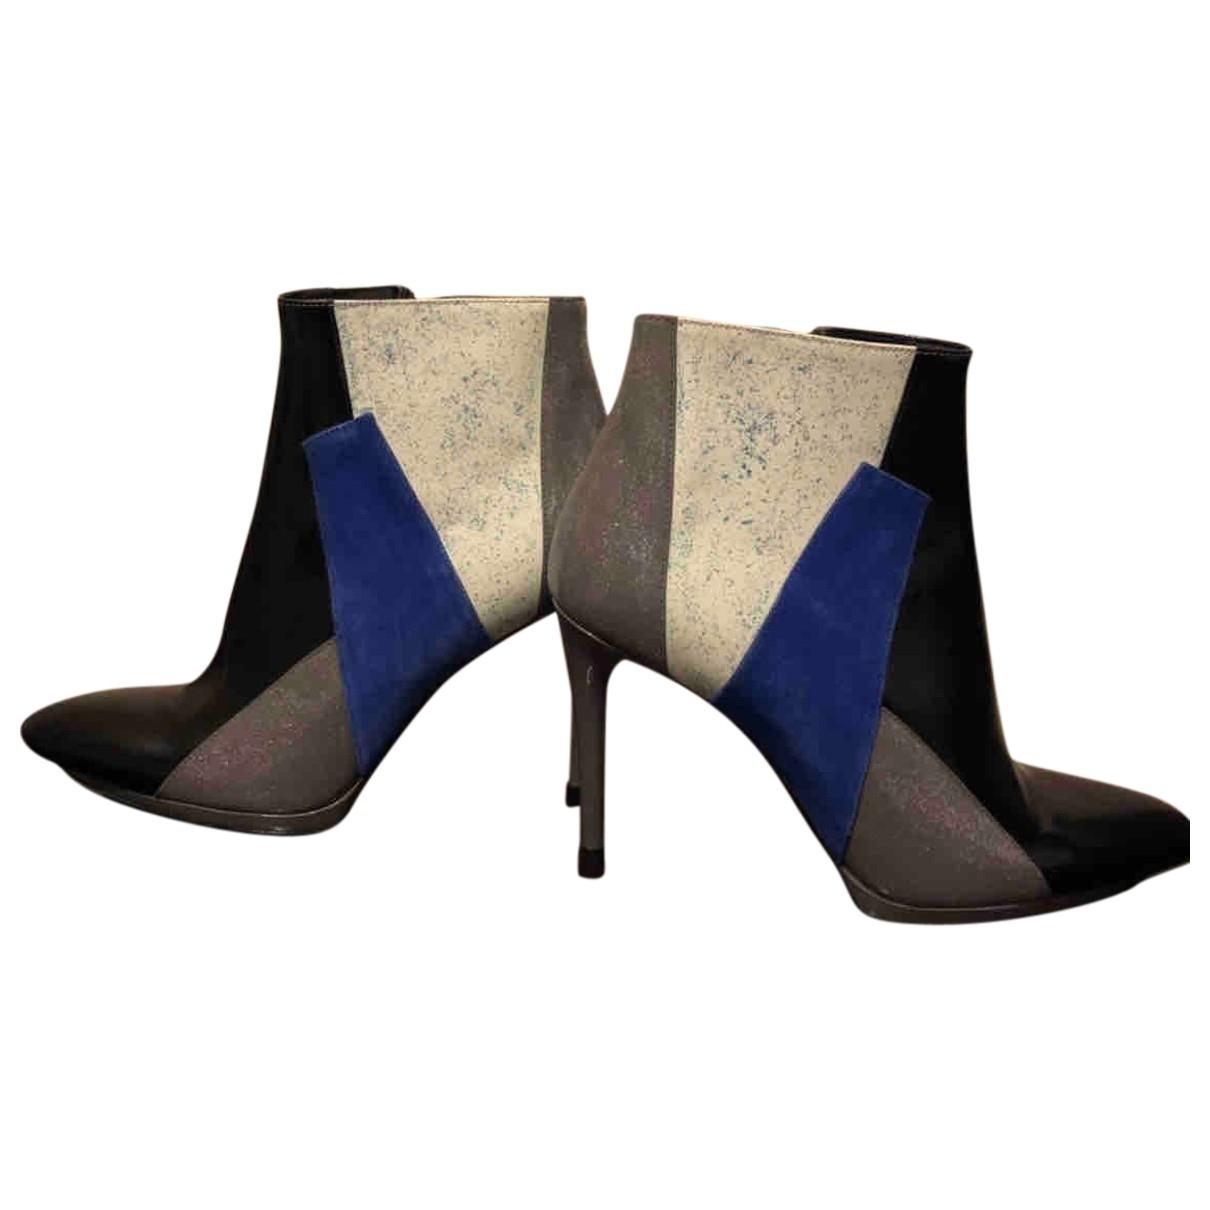 Balenciaga \N Multicolour Leather Ankle boots for Women 37 EU